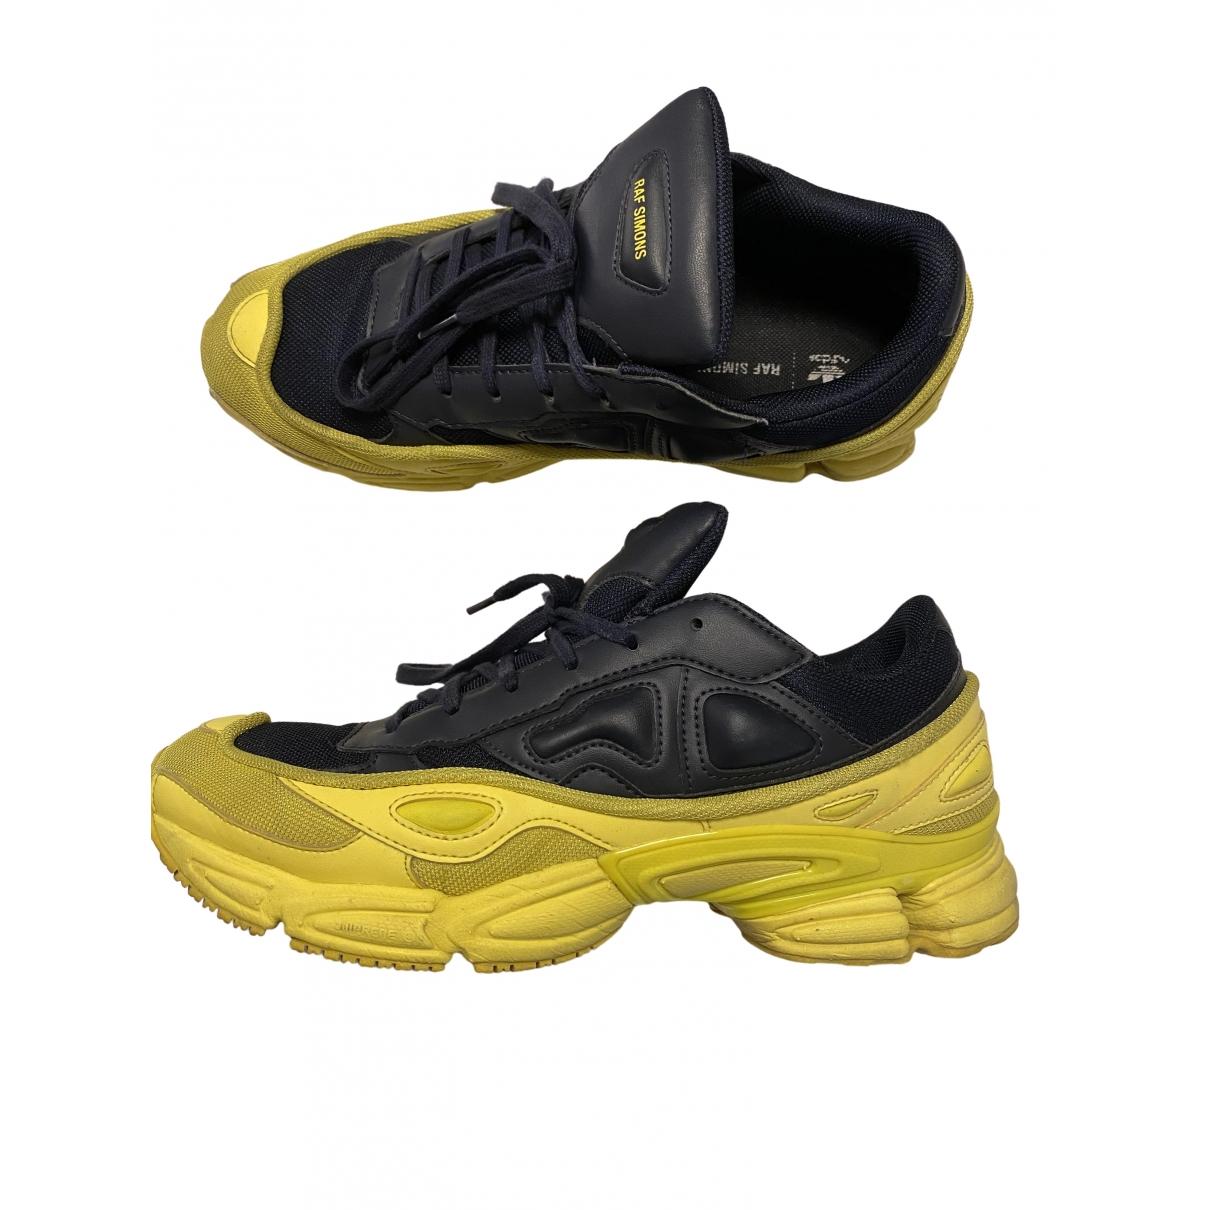 Adidas X Raf Simons Ozweego 2 Yellow Rubber Trainers for Men 10.5 UK